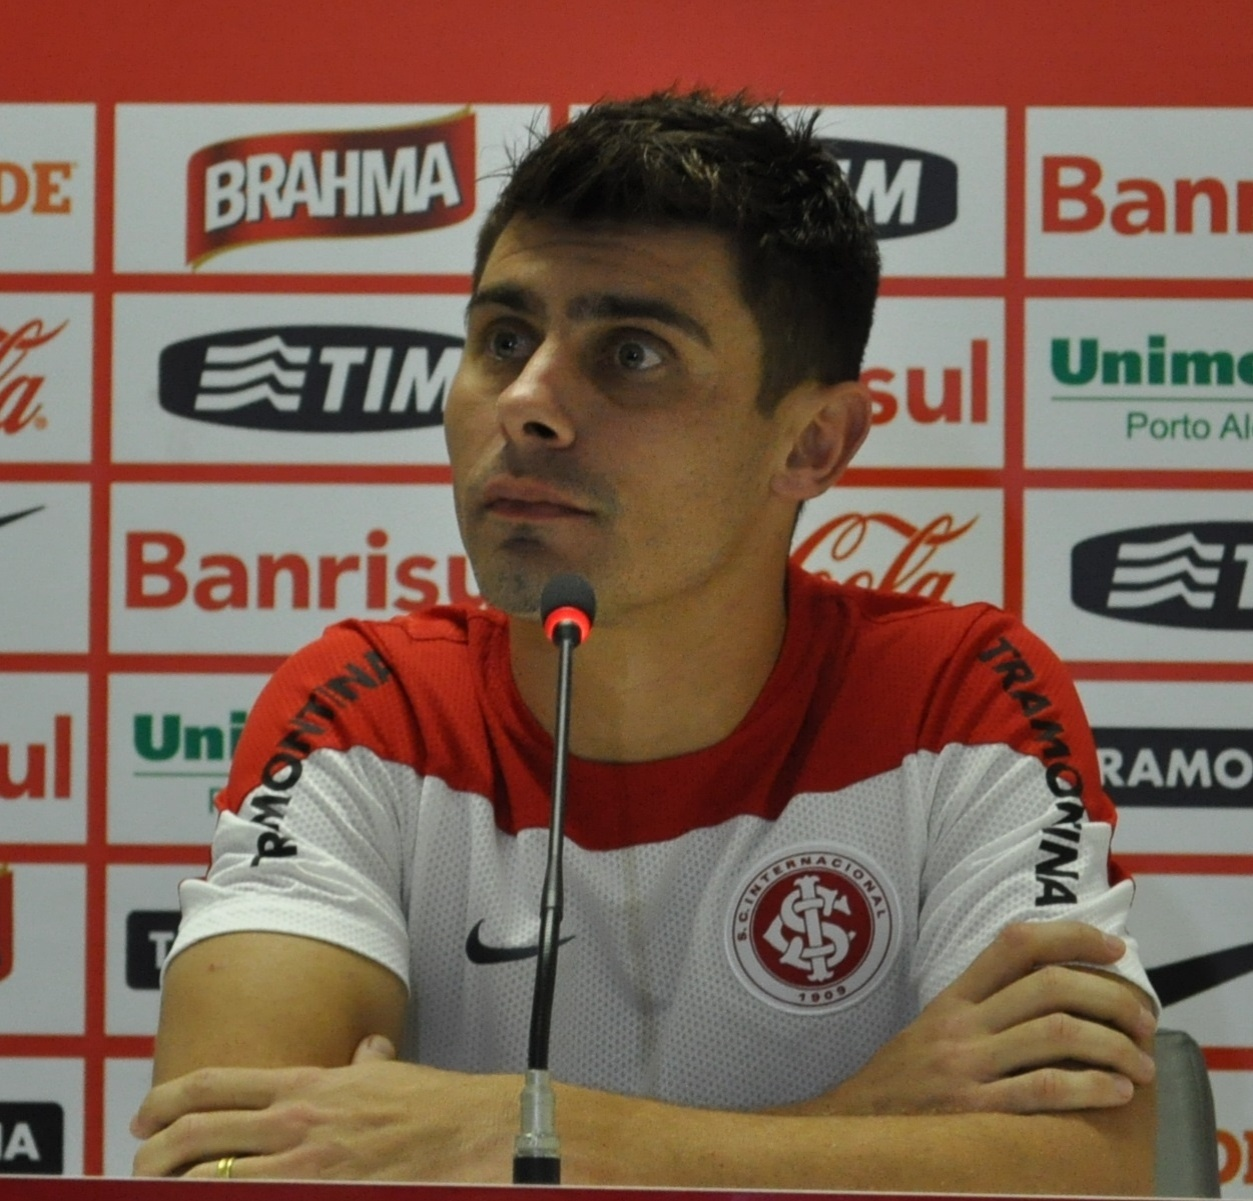 24 jul 2014 - Alex concede entrevista coletiva após treinamento do Inter